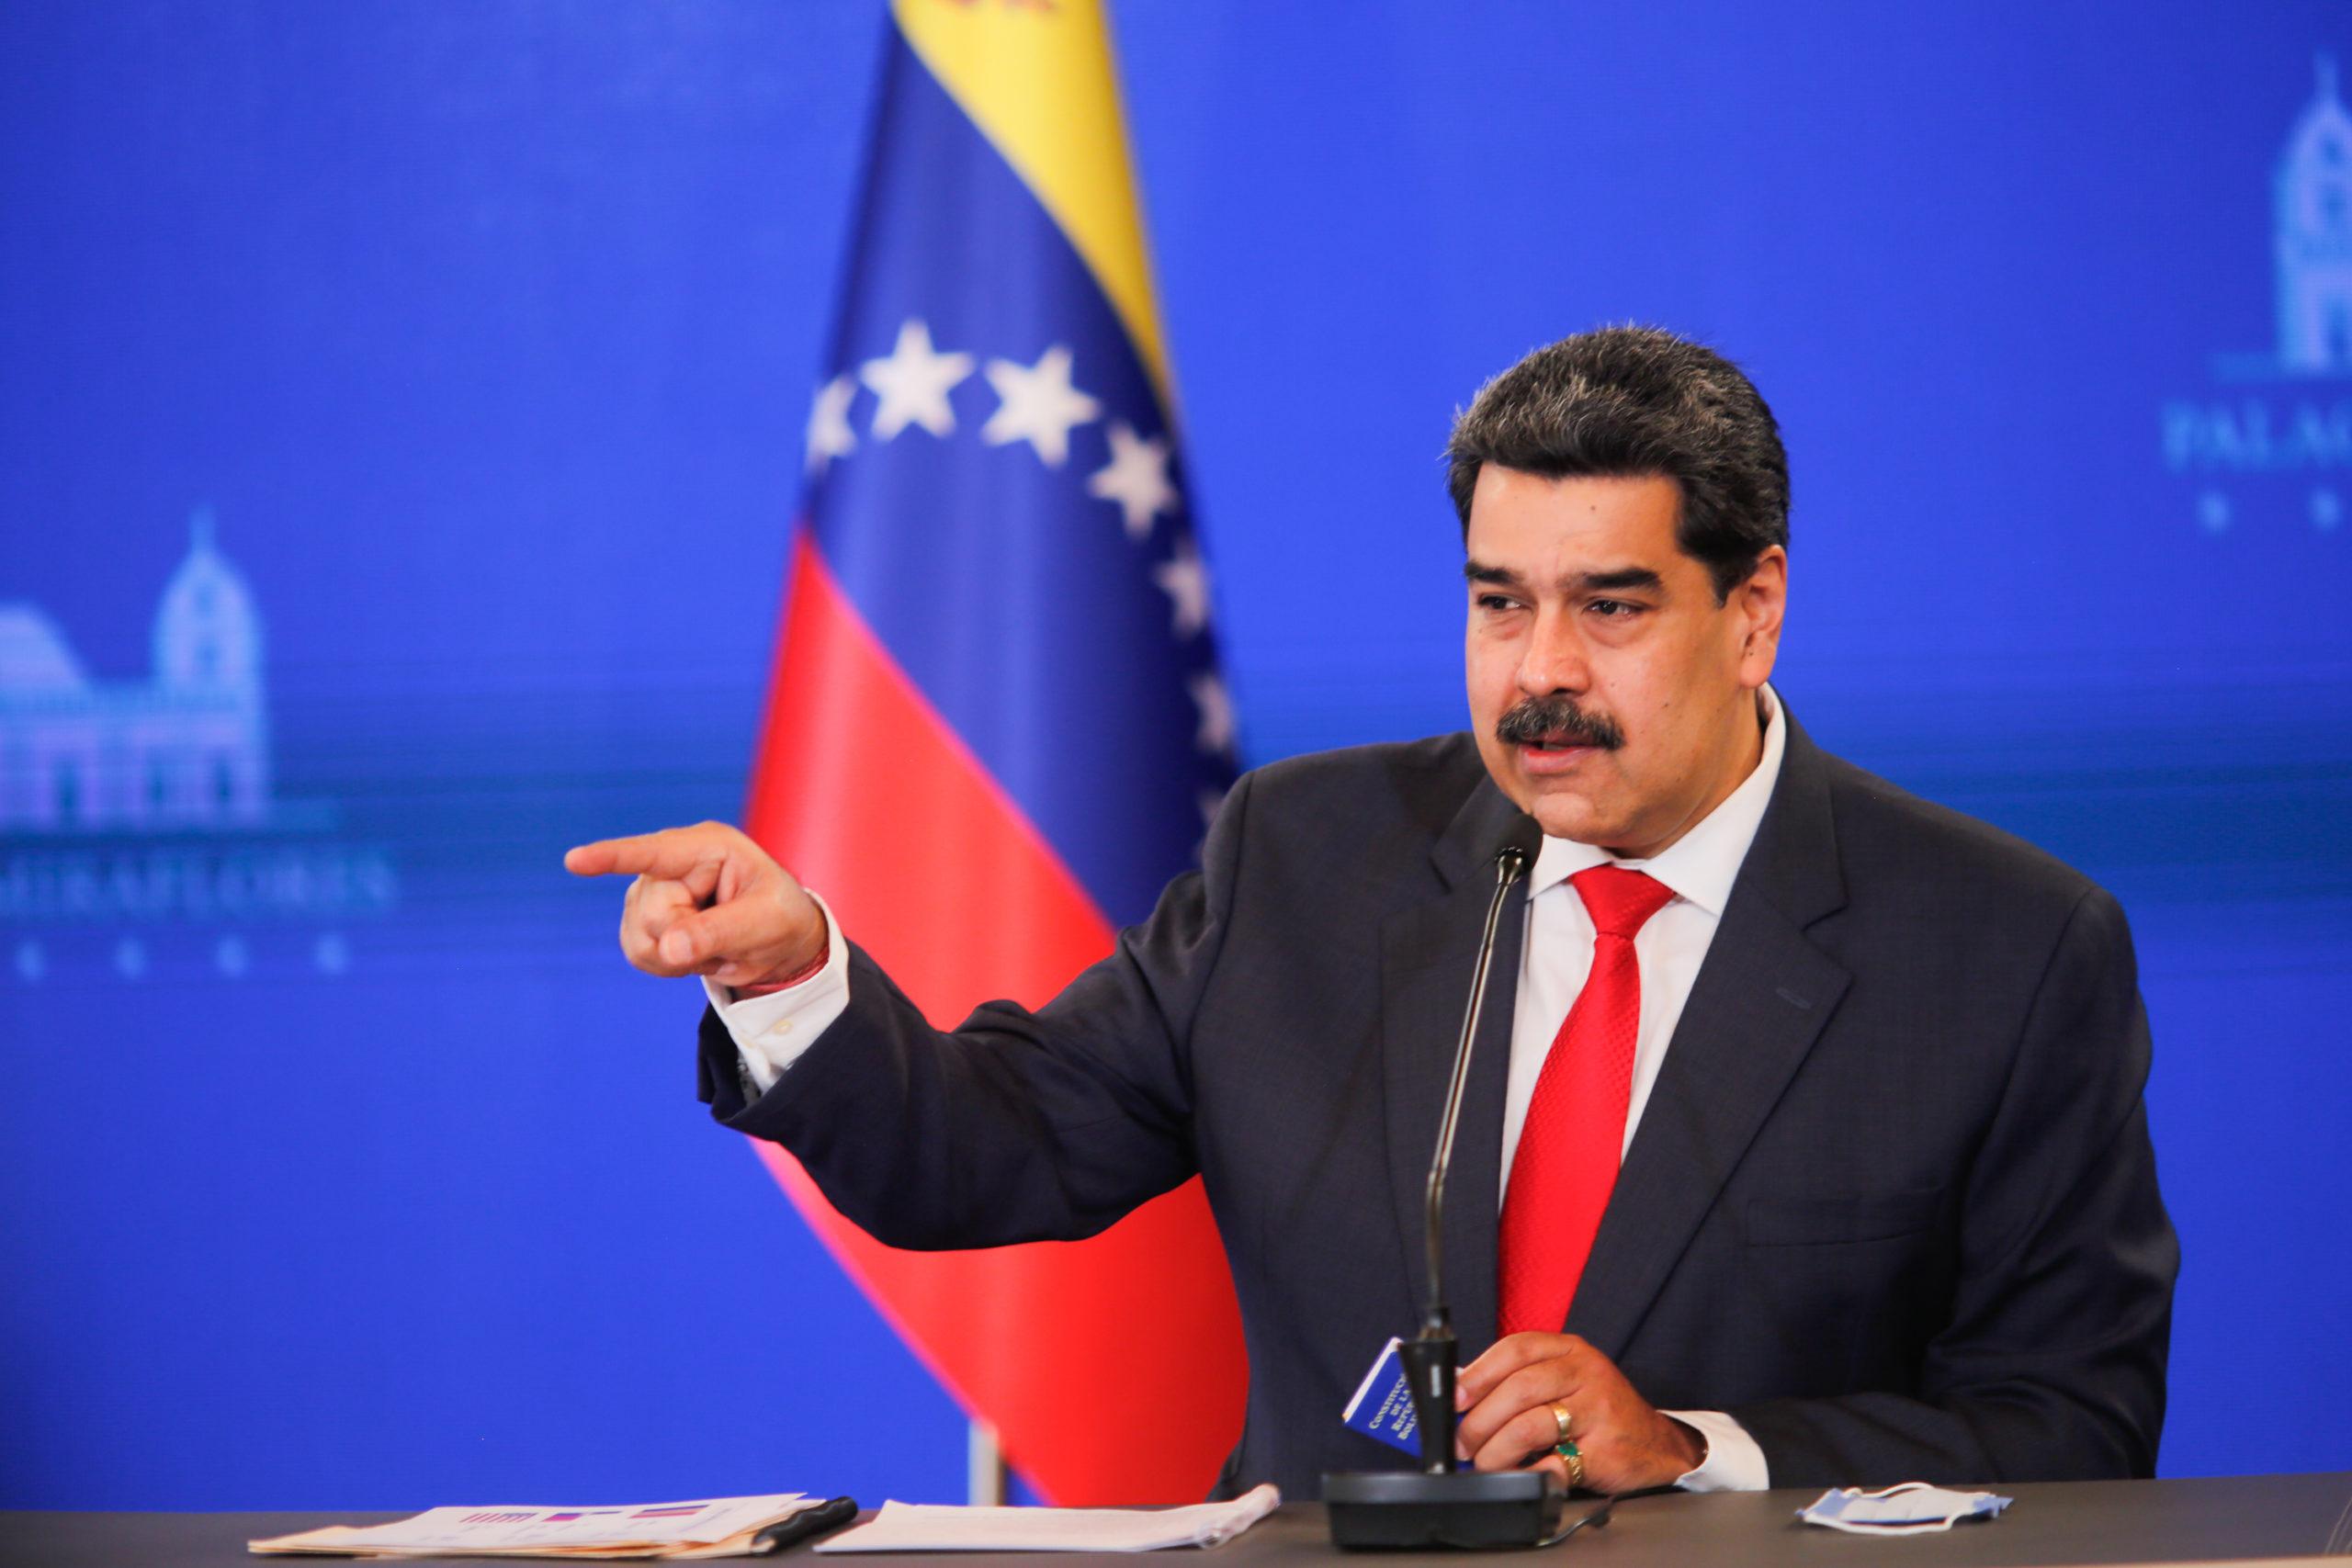 Constituyente de Maduro se va tras anular Parlamento opositor pero sin Constitución